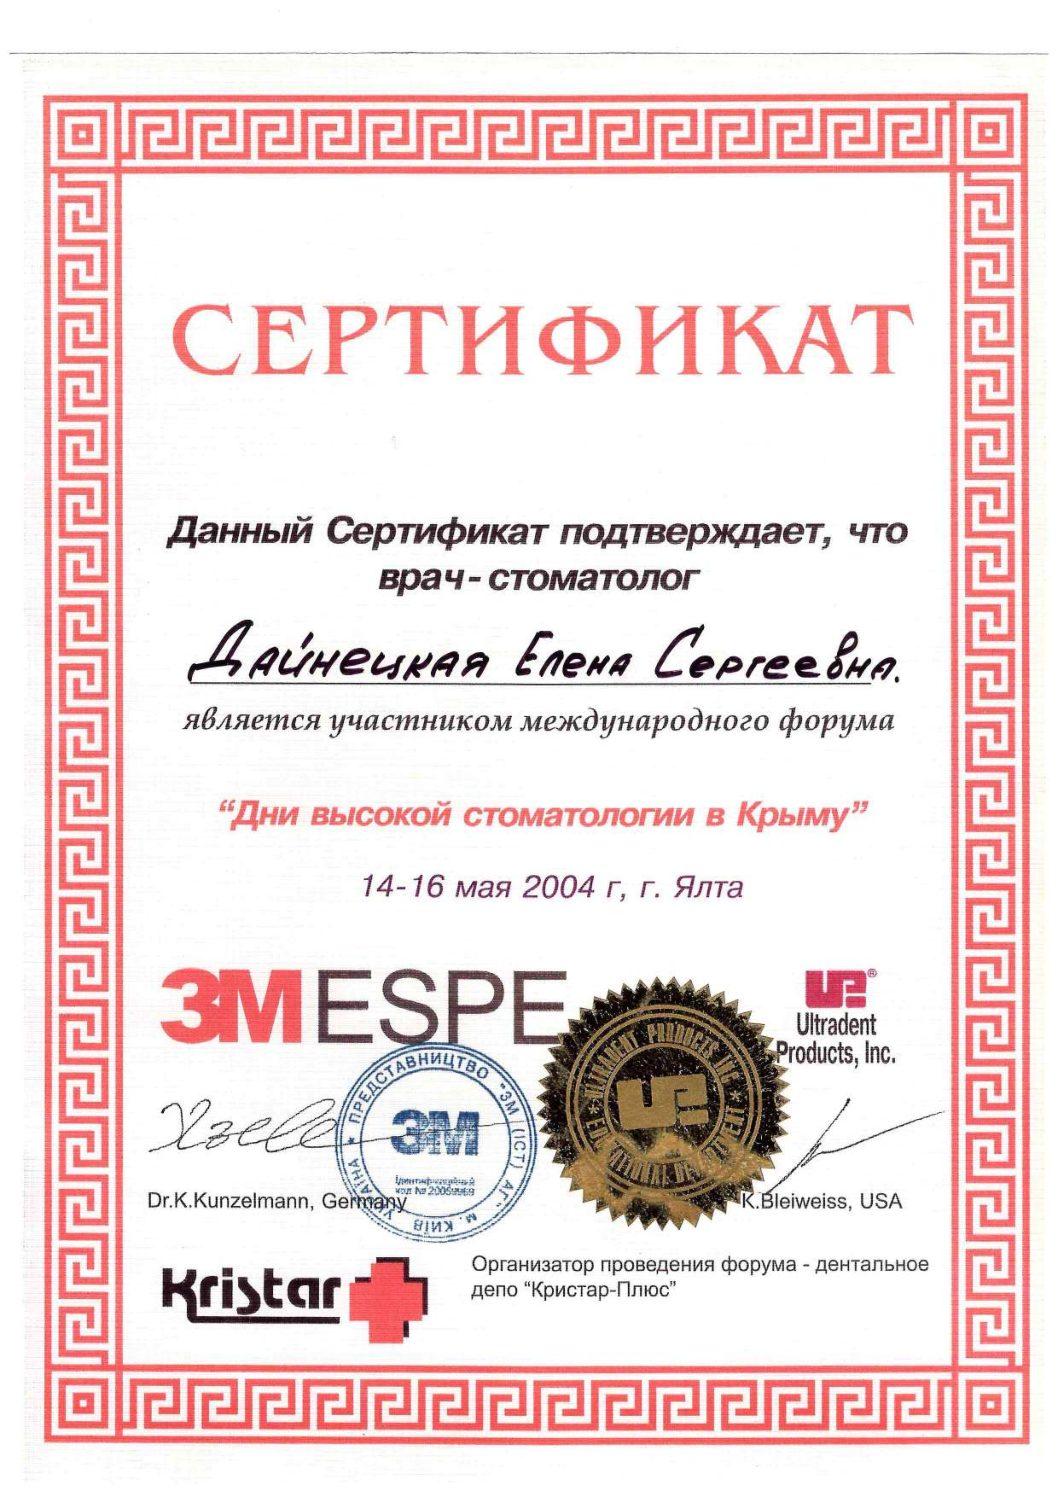 Untitled.FR21.tif compressed pdf - Олена Дайнецька